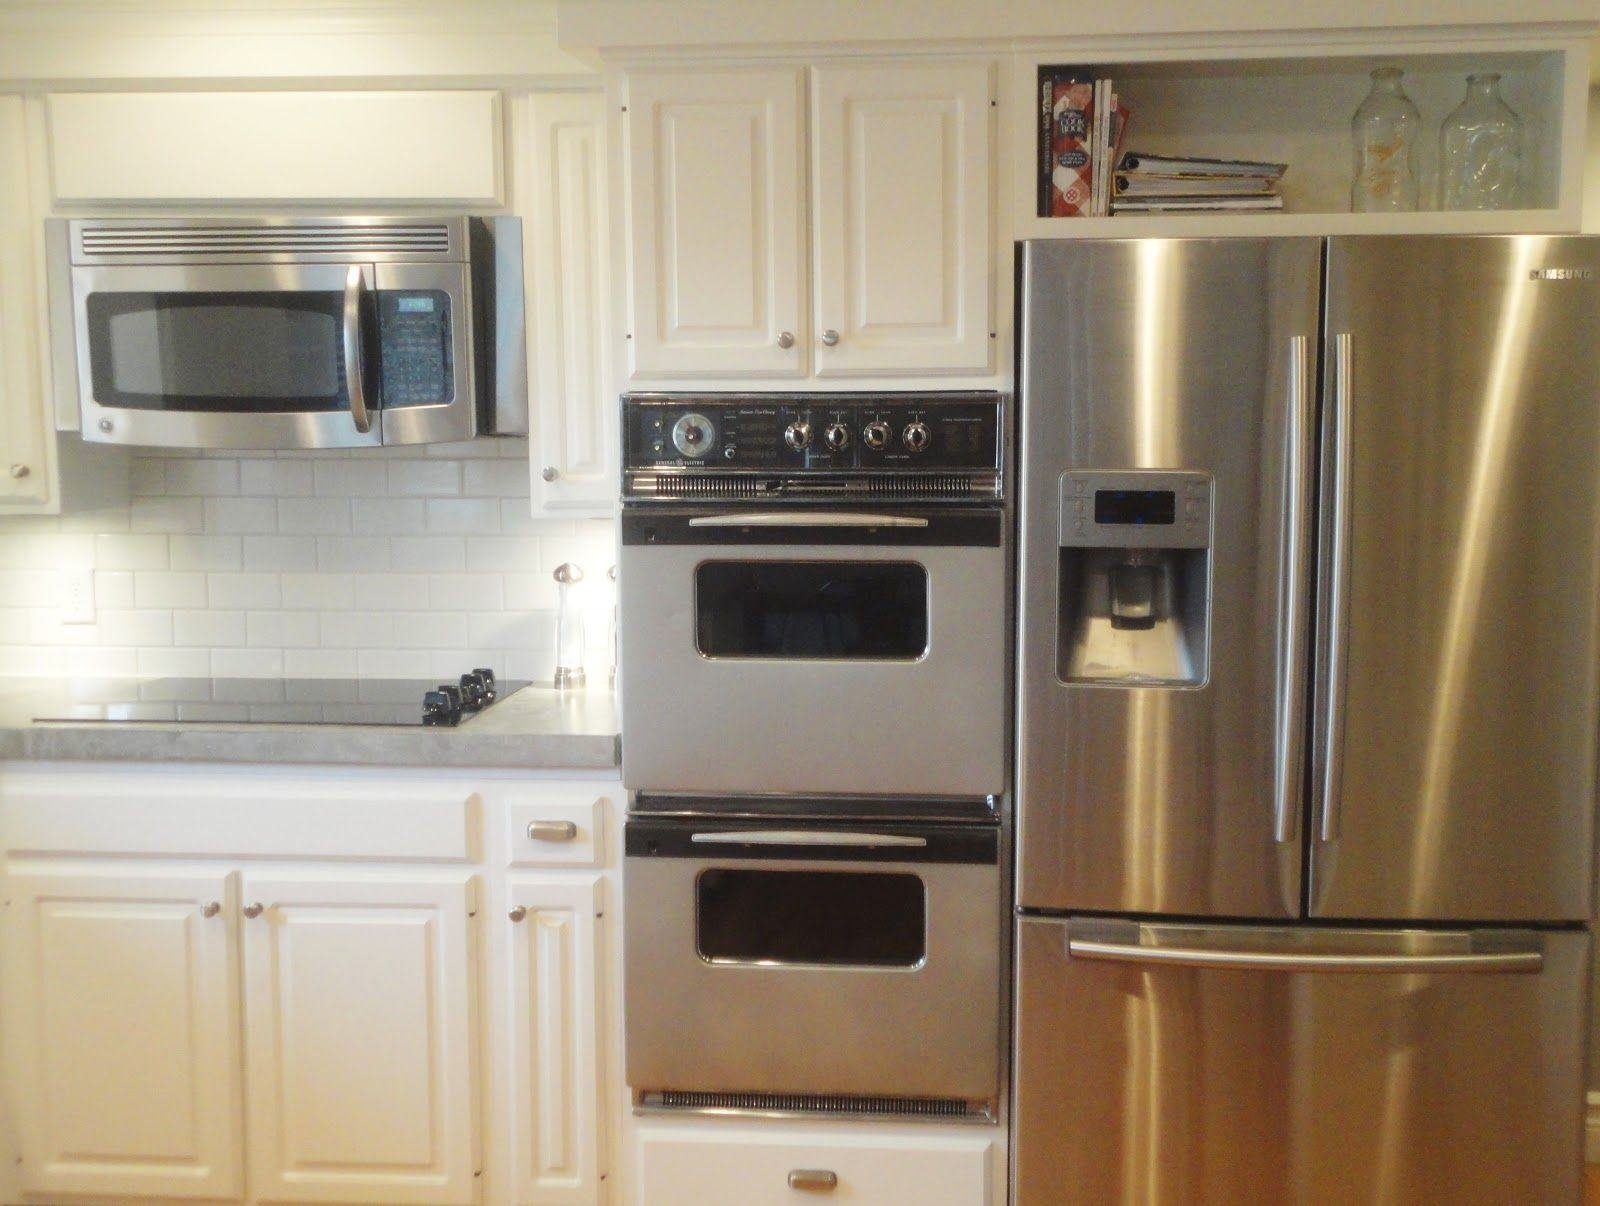 10 Beautiful Kitchen Cabinet Crown Molding Ideas kitchen cabinets molding ideas home wall decoration 2020